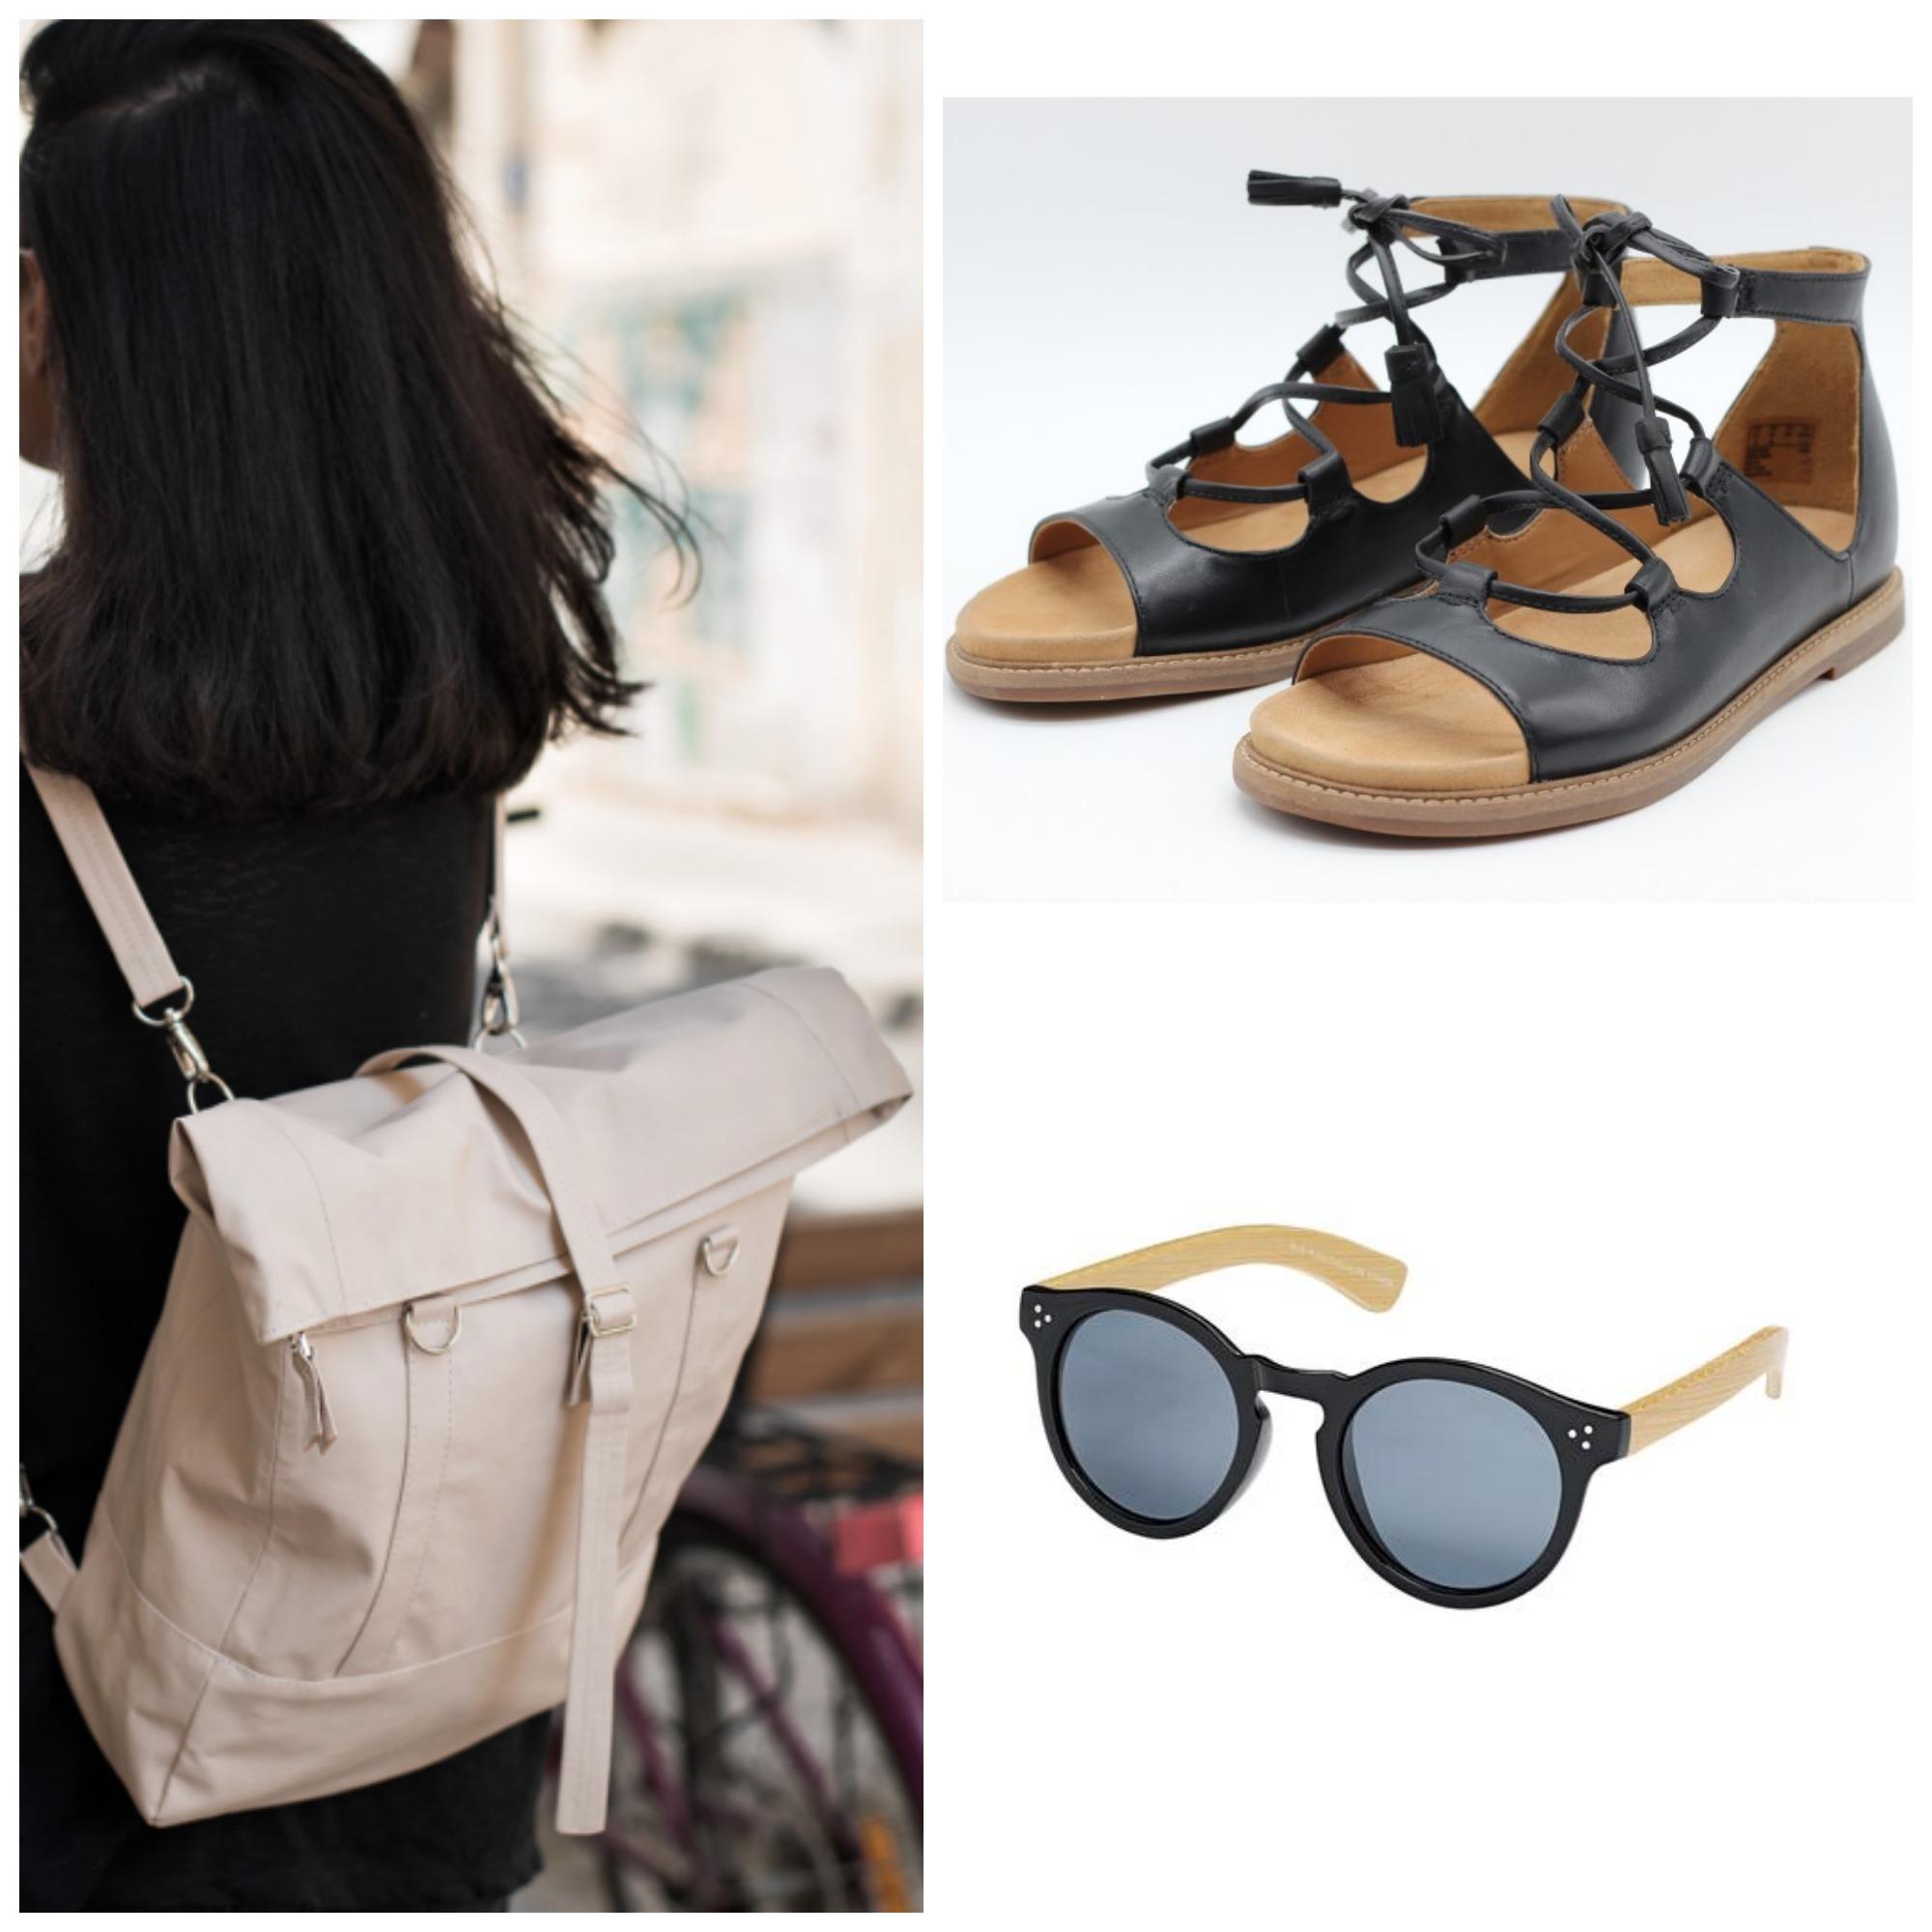 Lee Coren vegan backpack, Clarks 'Corsio' sandal,Blue Planet sunglasses